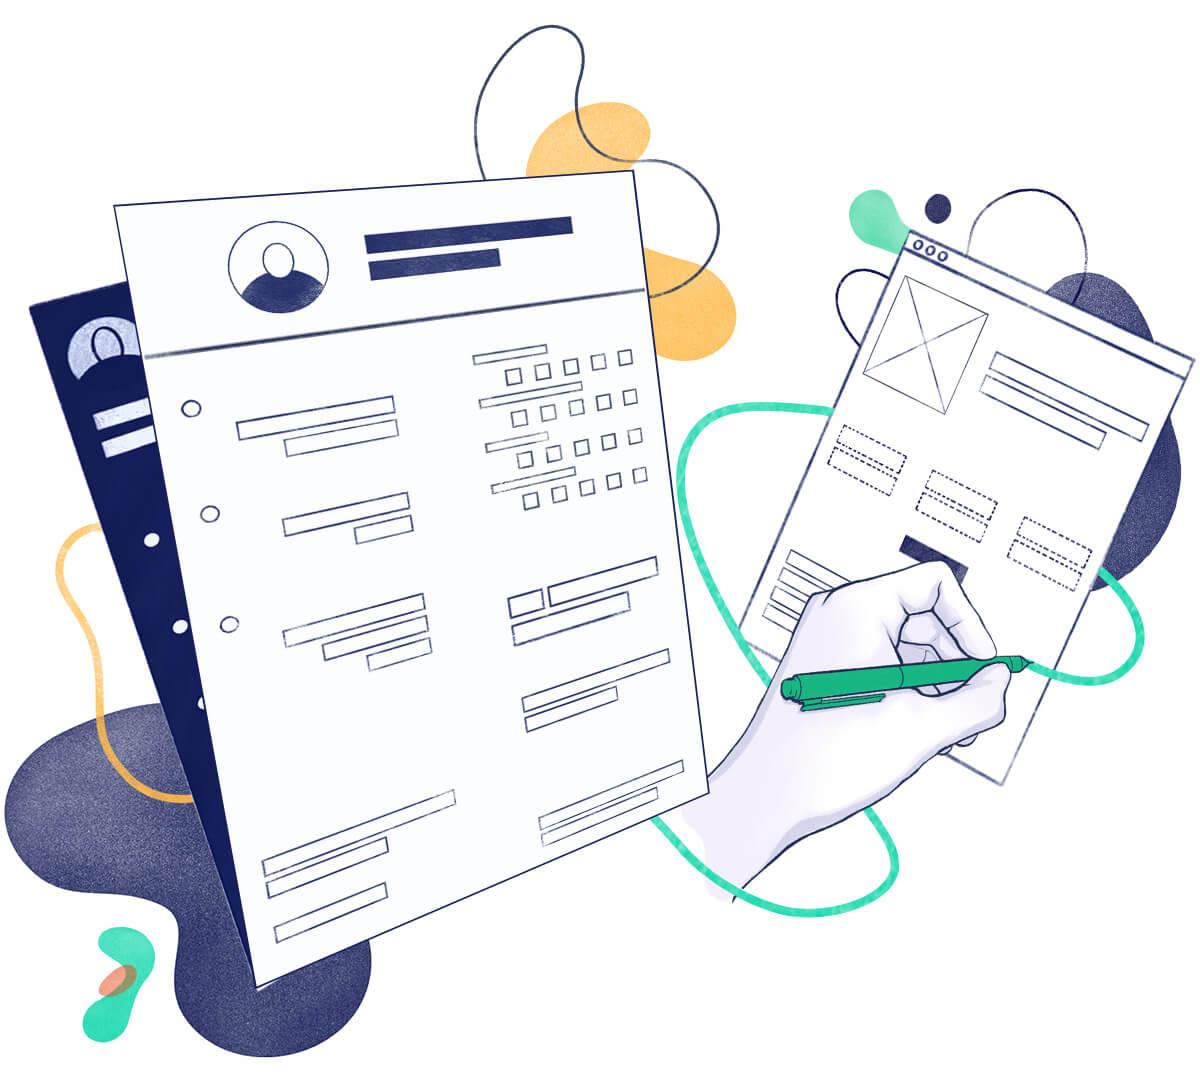 Web Designer CV Examples & 21 Tips [Template & Guide]